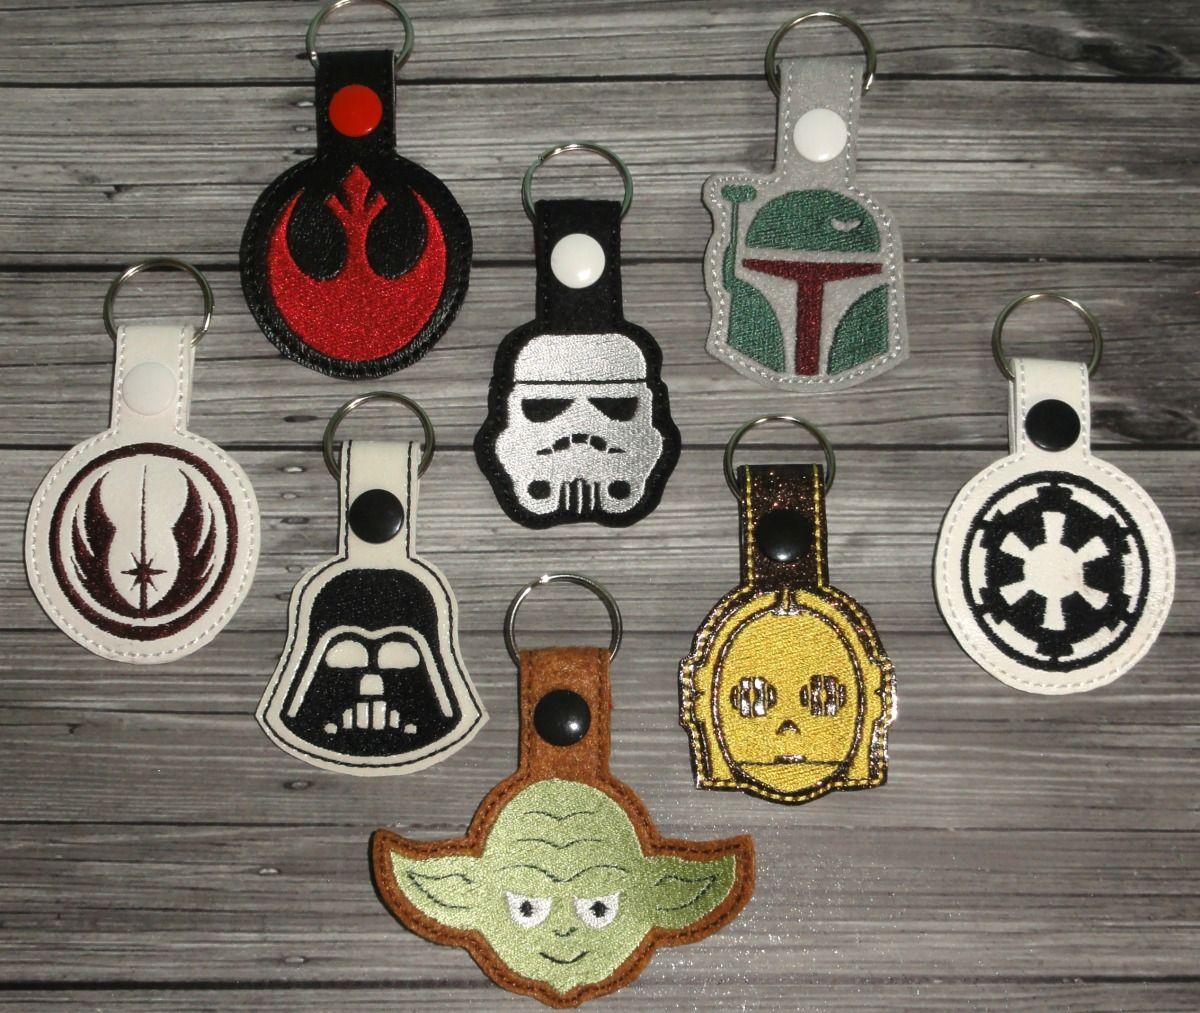 Star Wars Keychain Set Ith Embroidery Design Machine